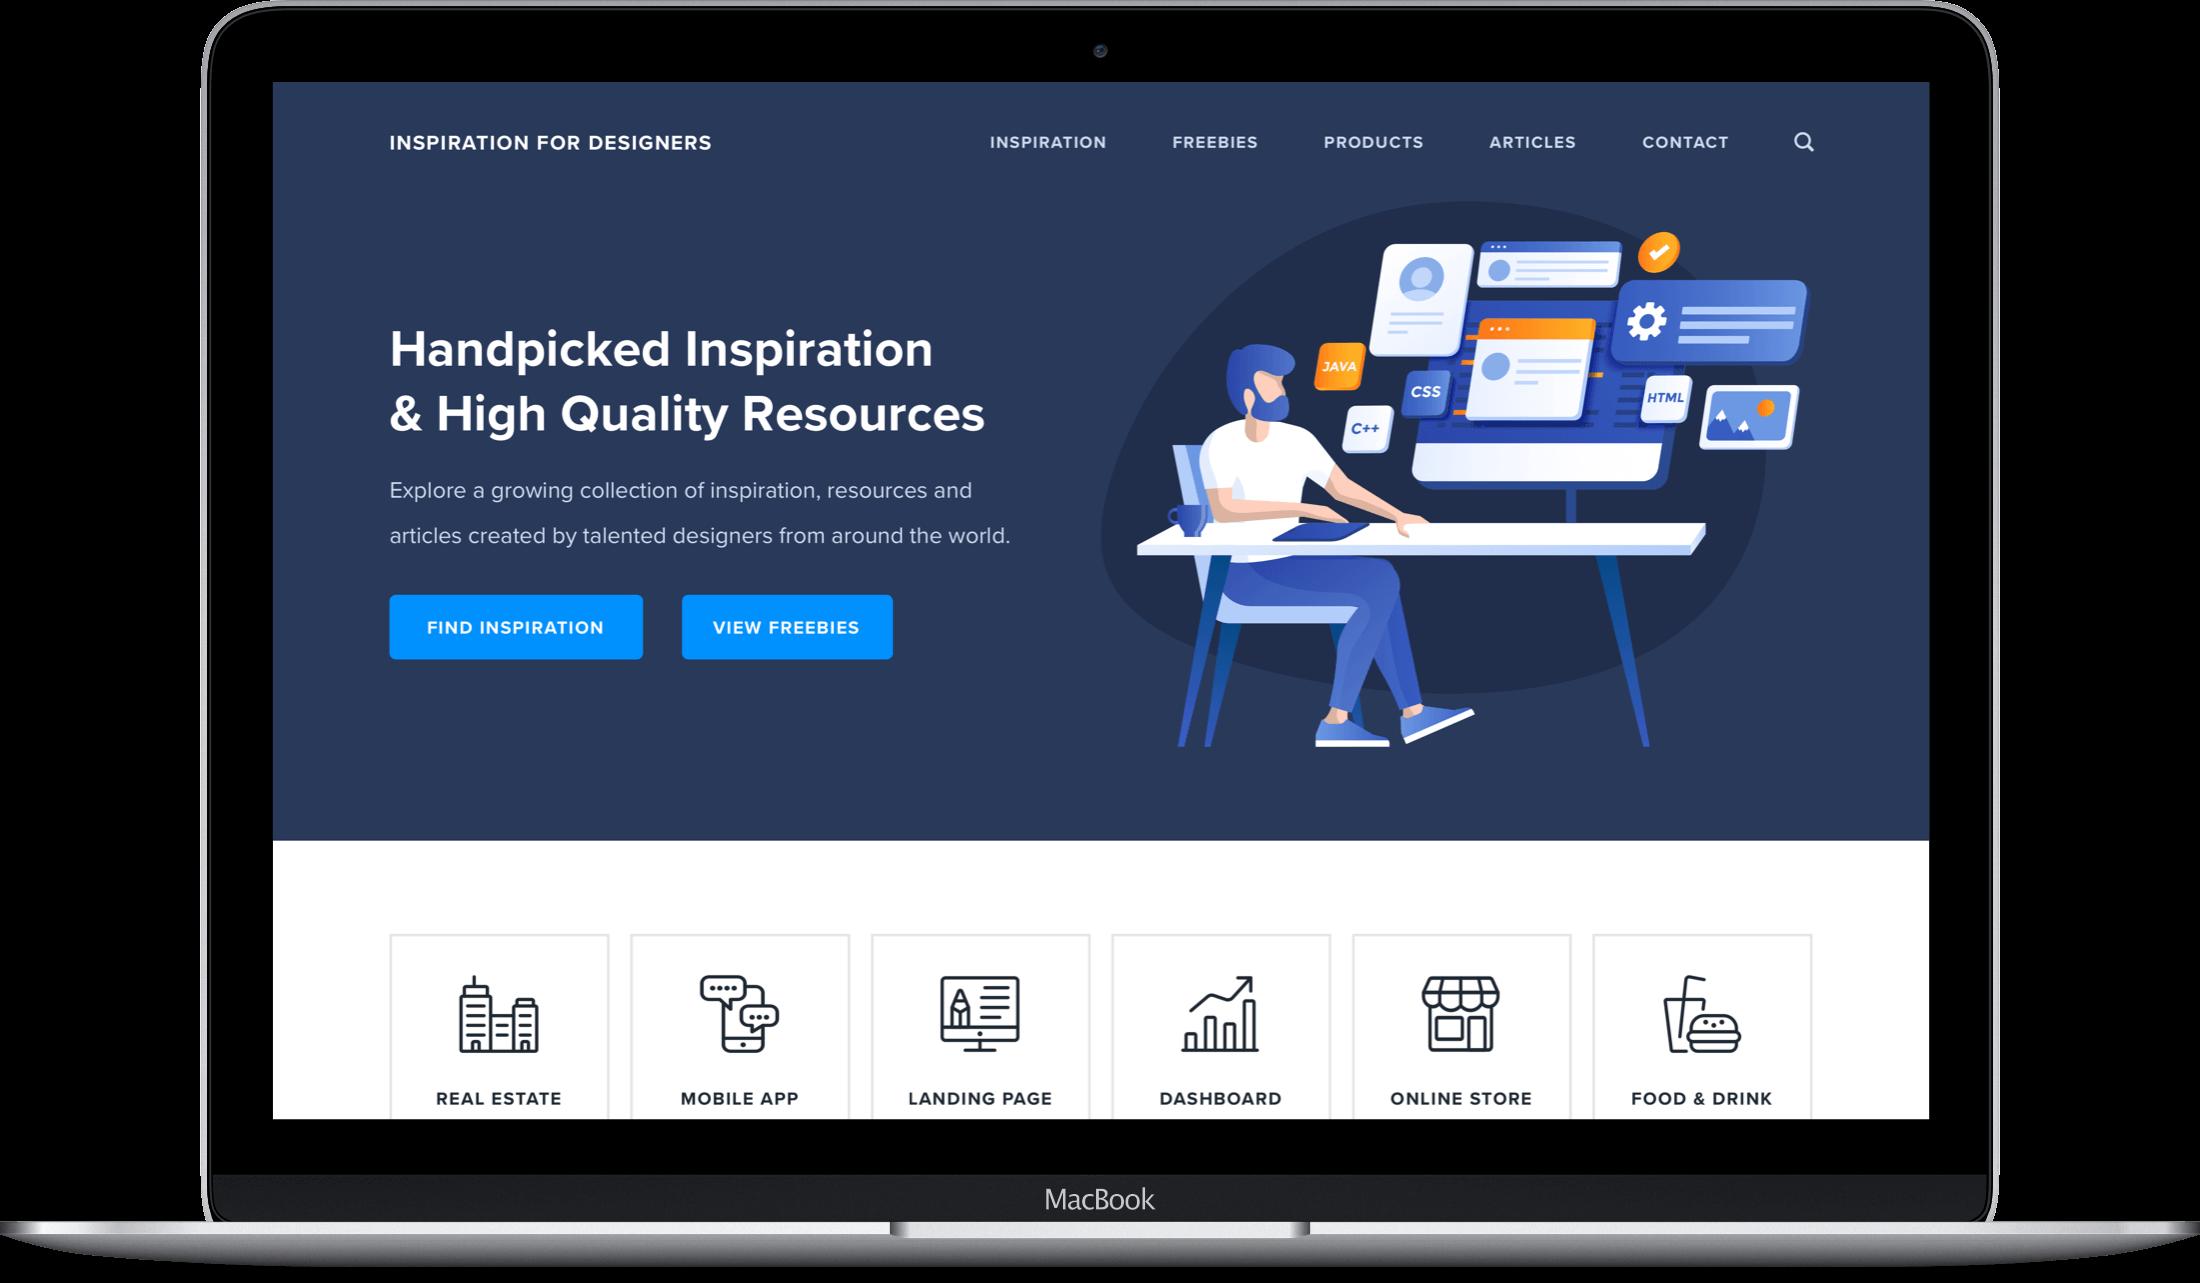 Inspiration For Designers website on a MacBook screen